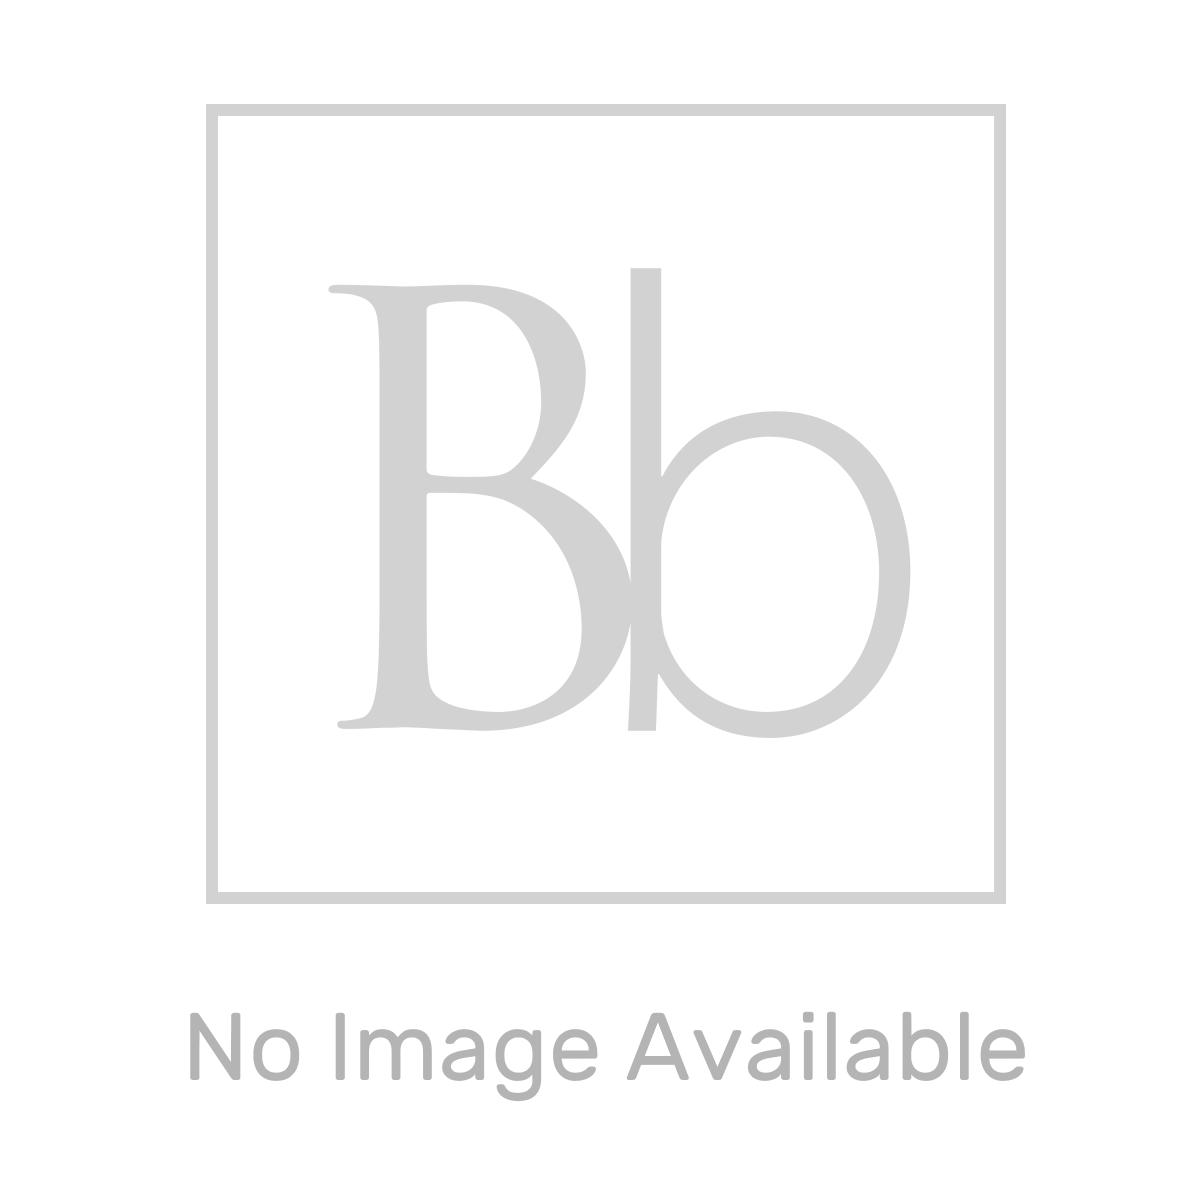 Burlington Matt White Freestanding Left End Round Vanity Unit 980mm Carrara White